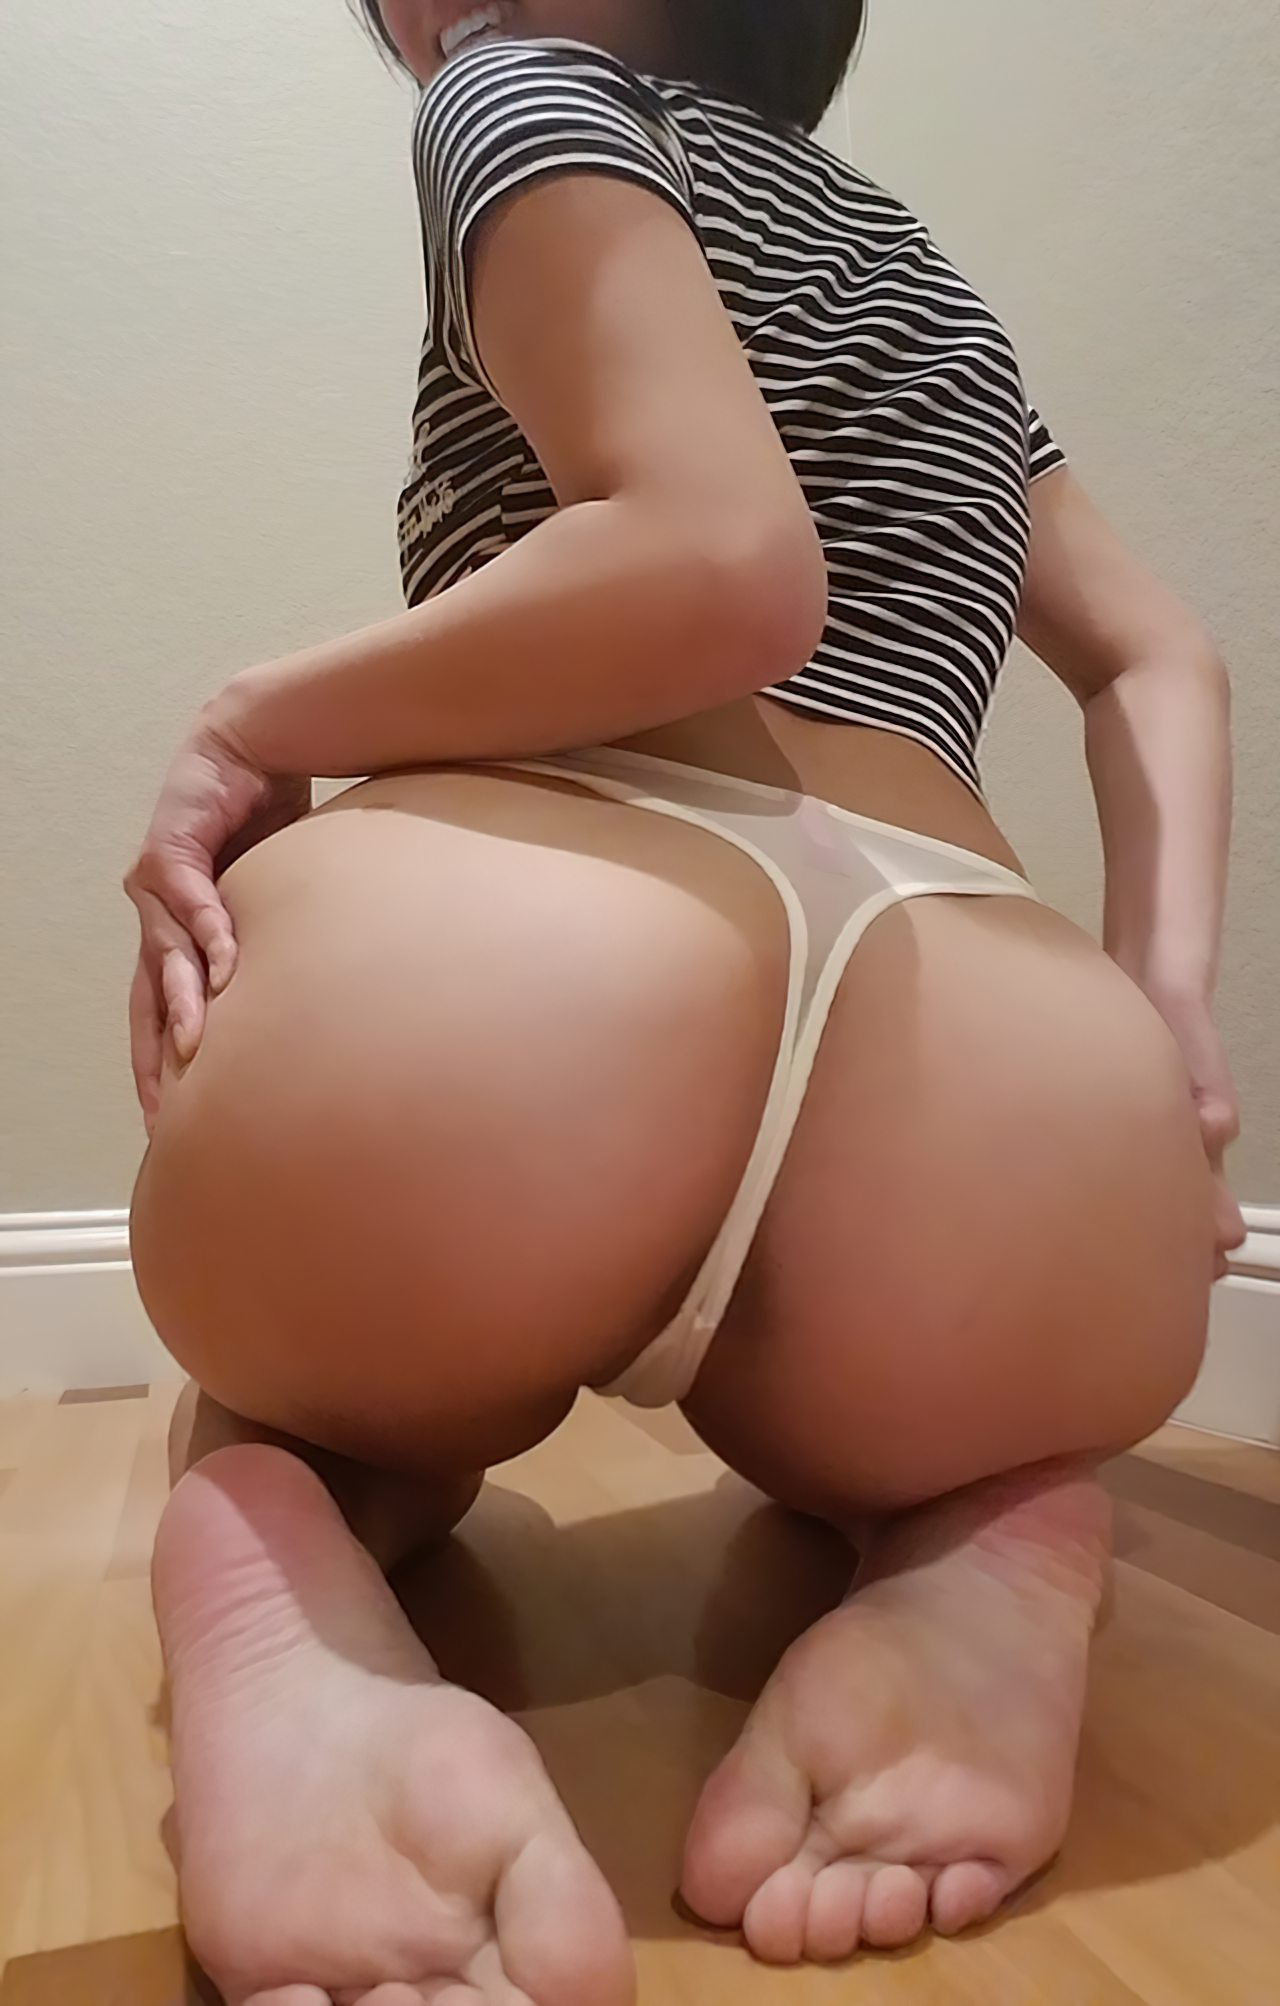 Gostosa Mostrando Bumbum Sexy